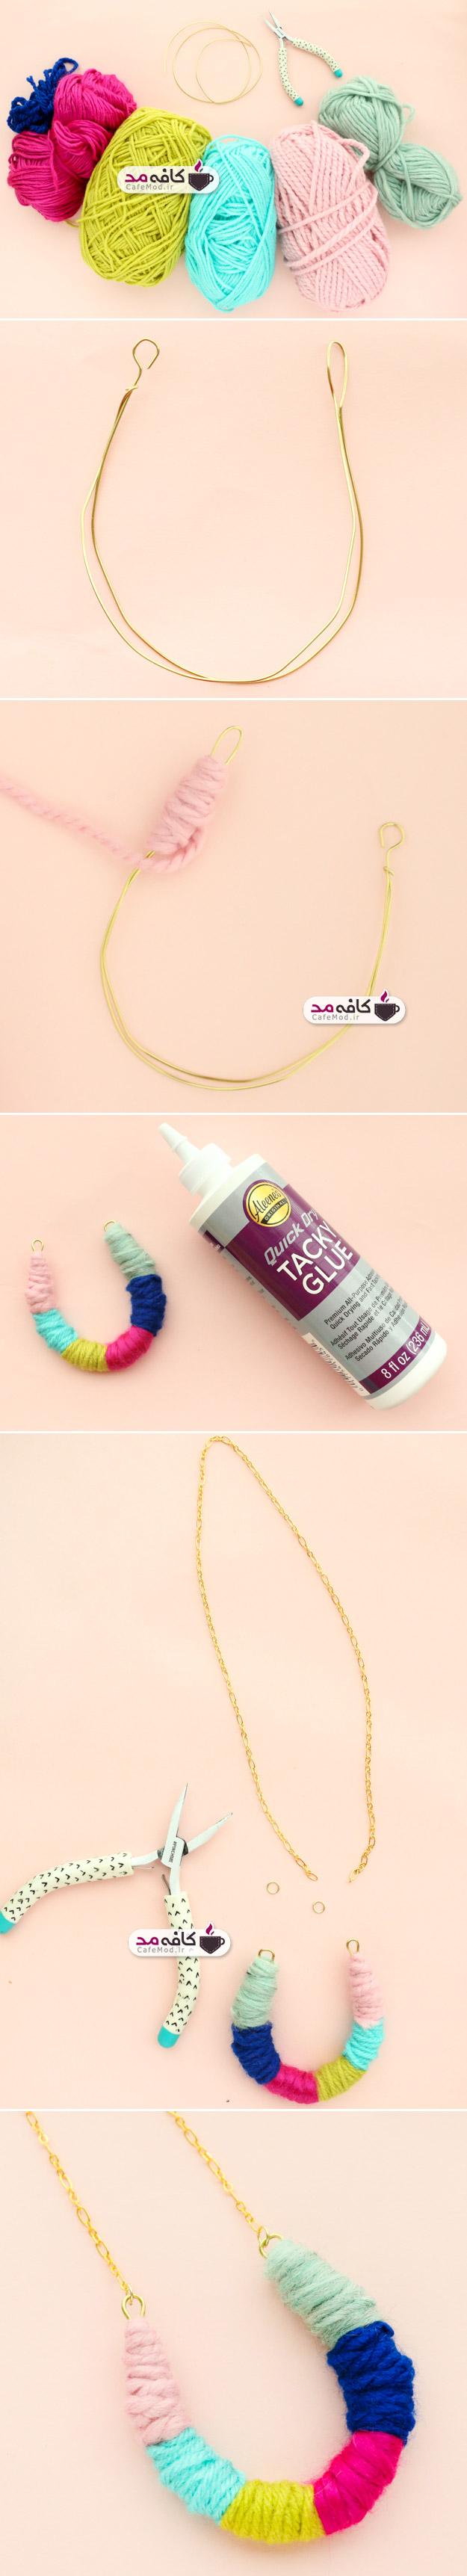 ساخت گردنبند رنگارنگ